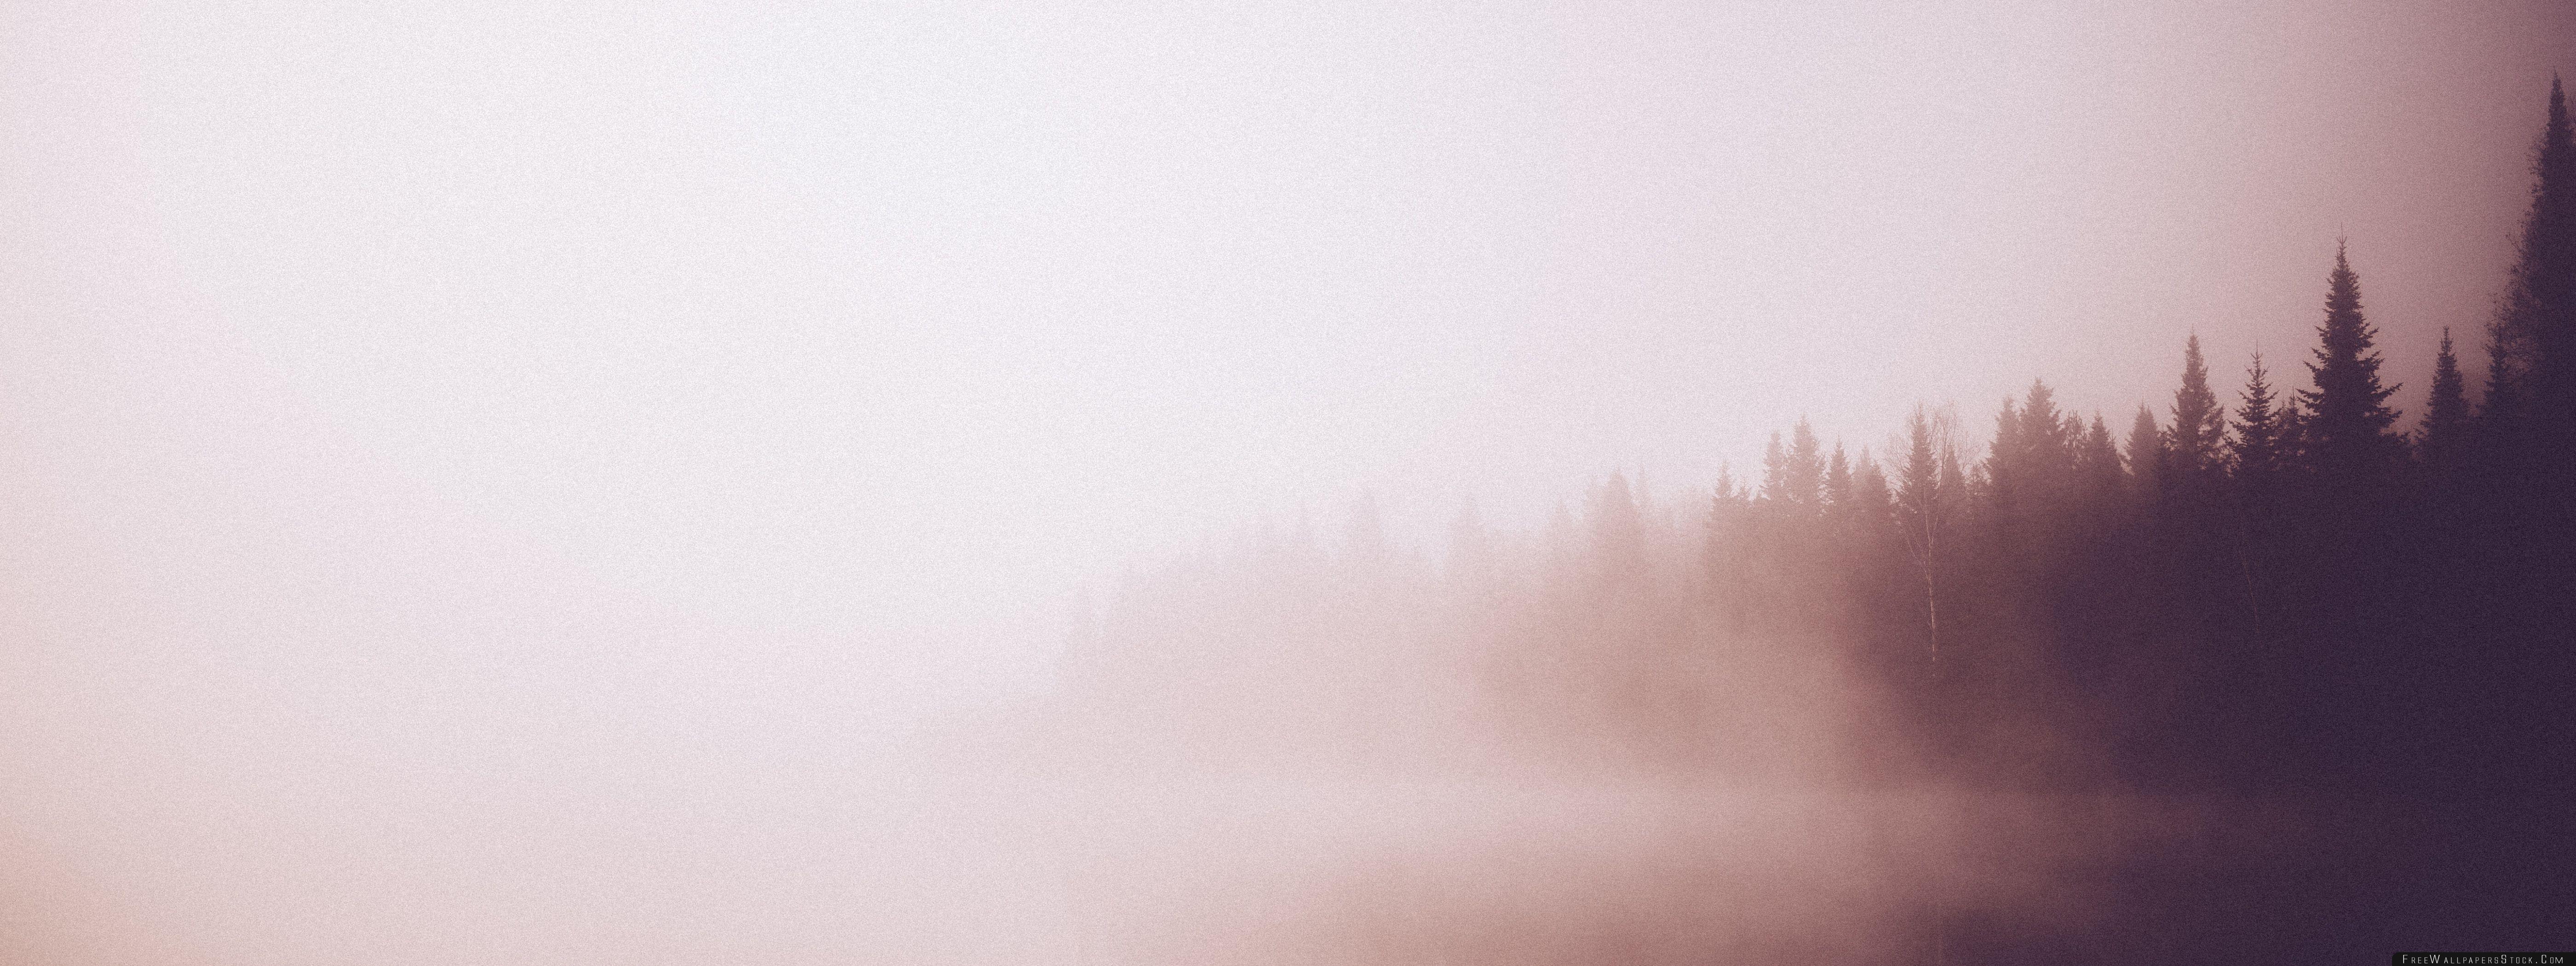 Download Free Wallpaper Vintage Forest   Lake